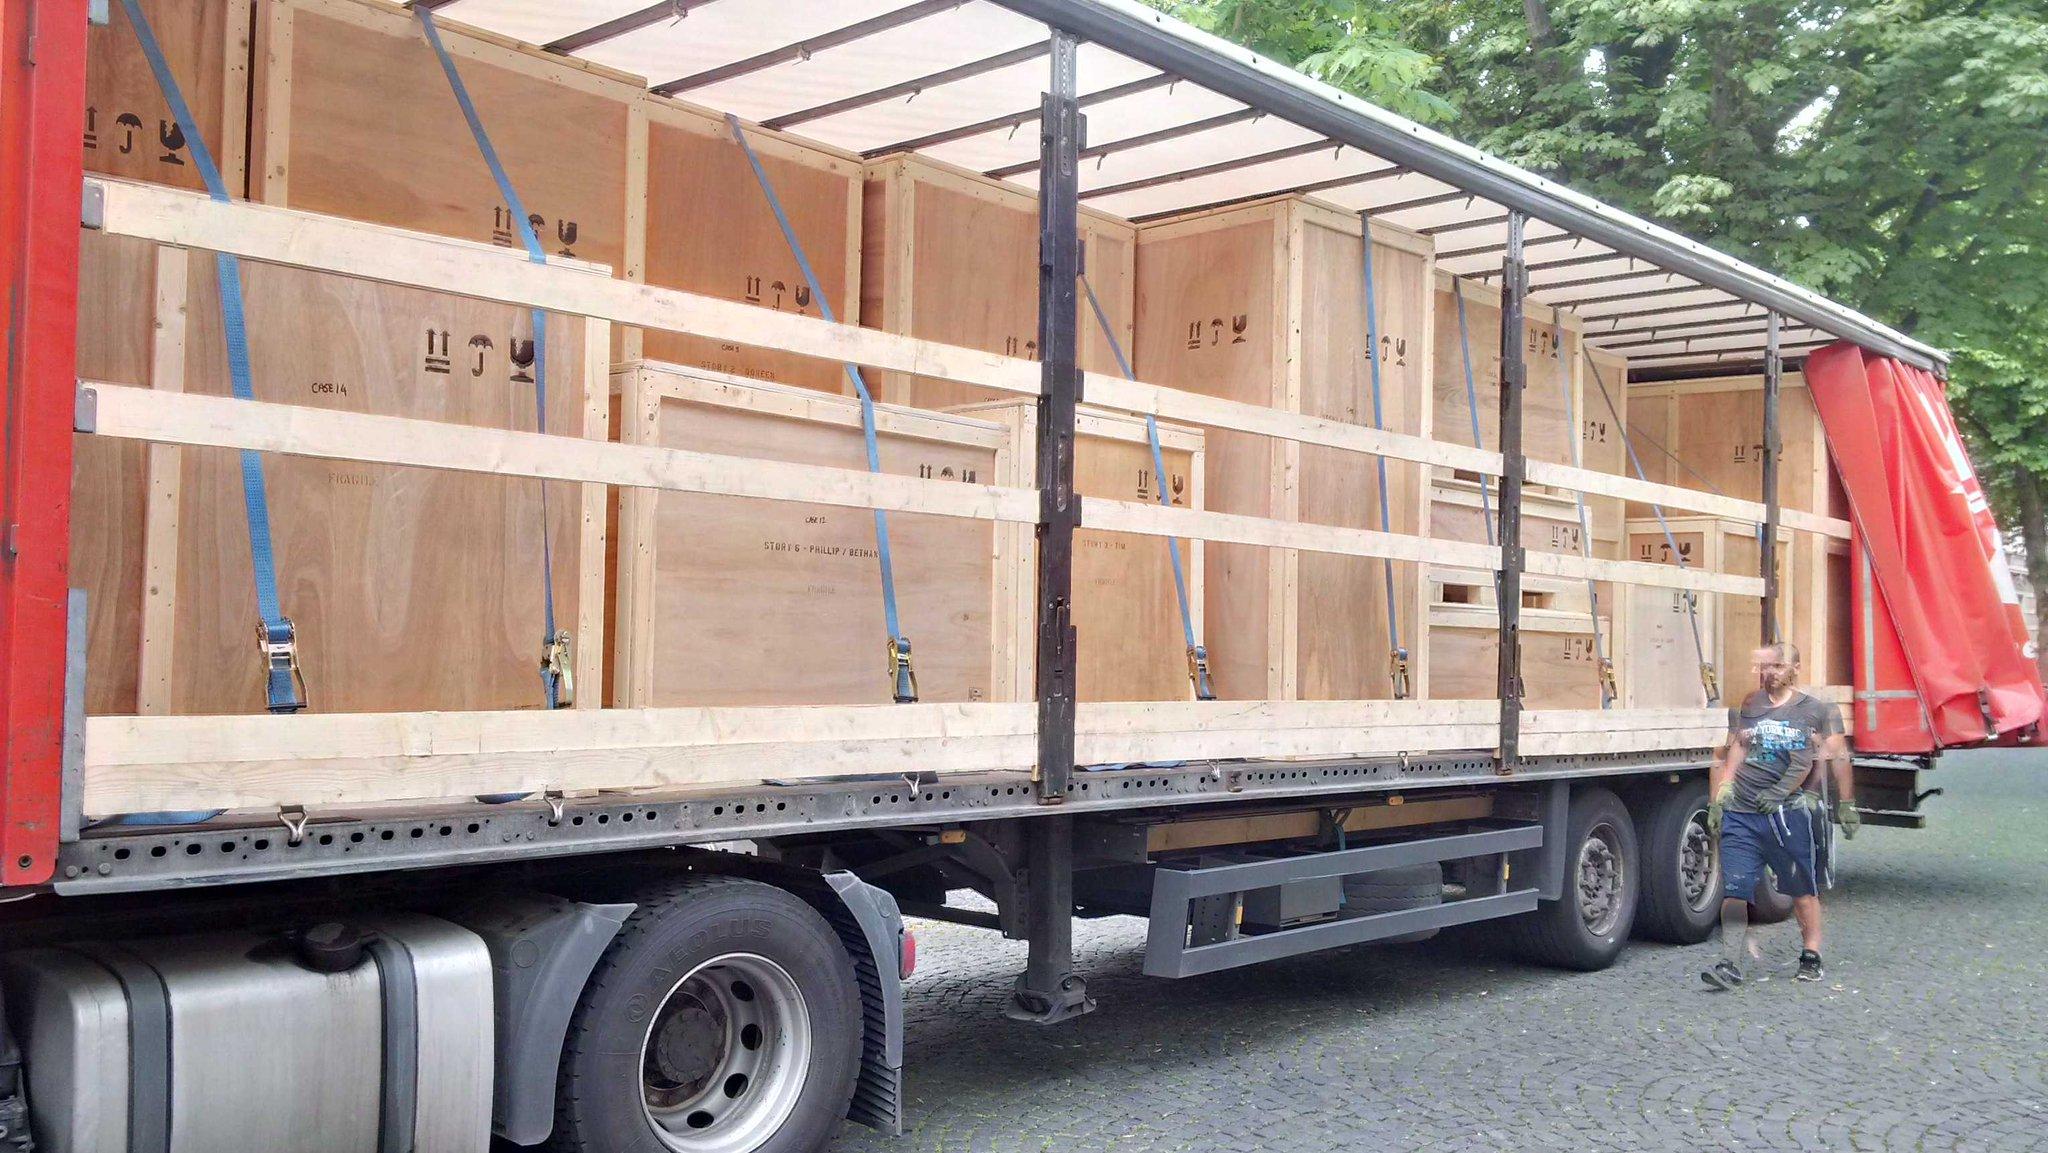 @sparks_eu The truck has arrived. Let's go. https://t.co/E5931oTMPm